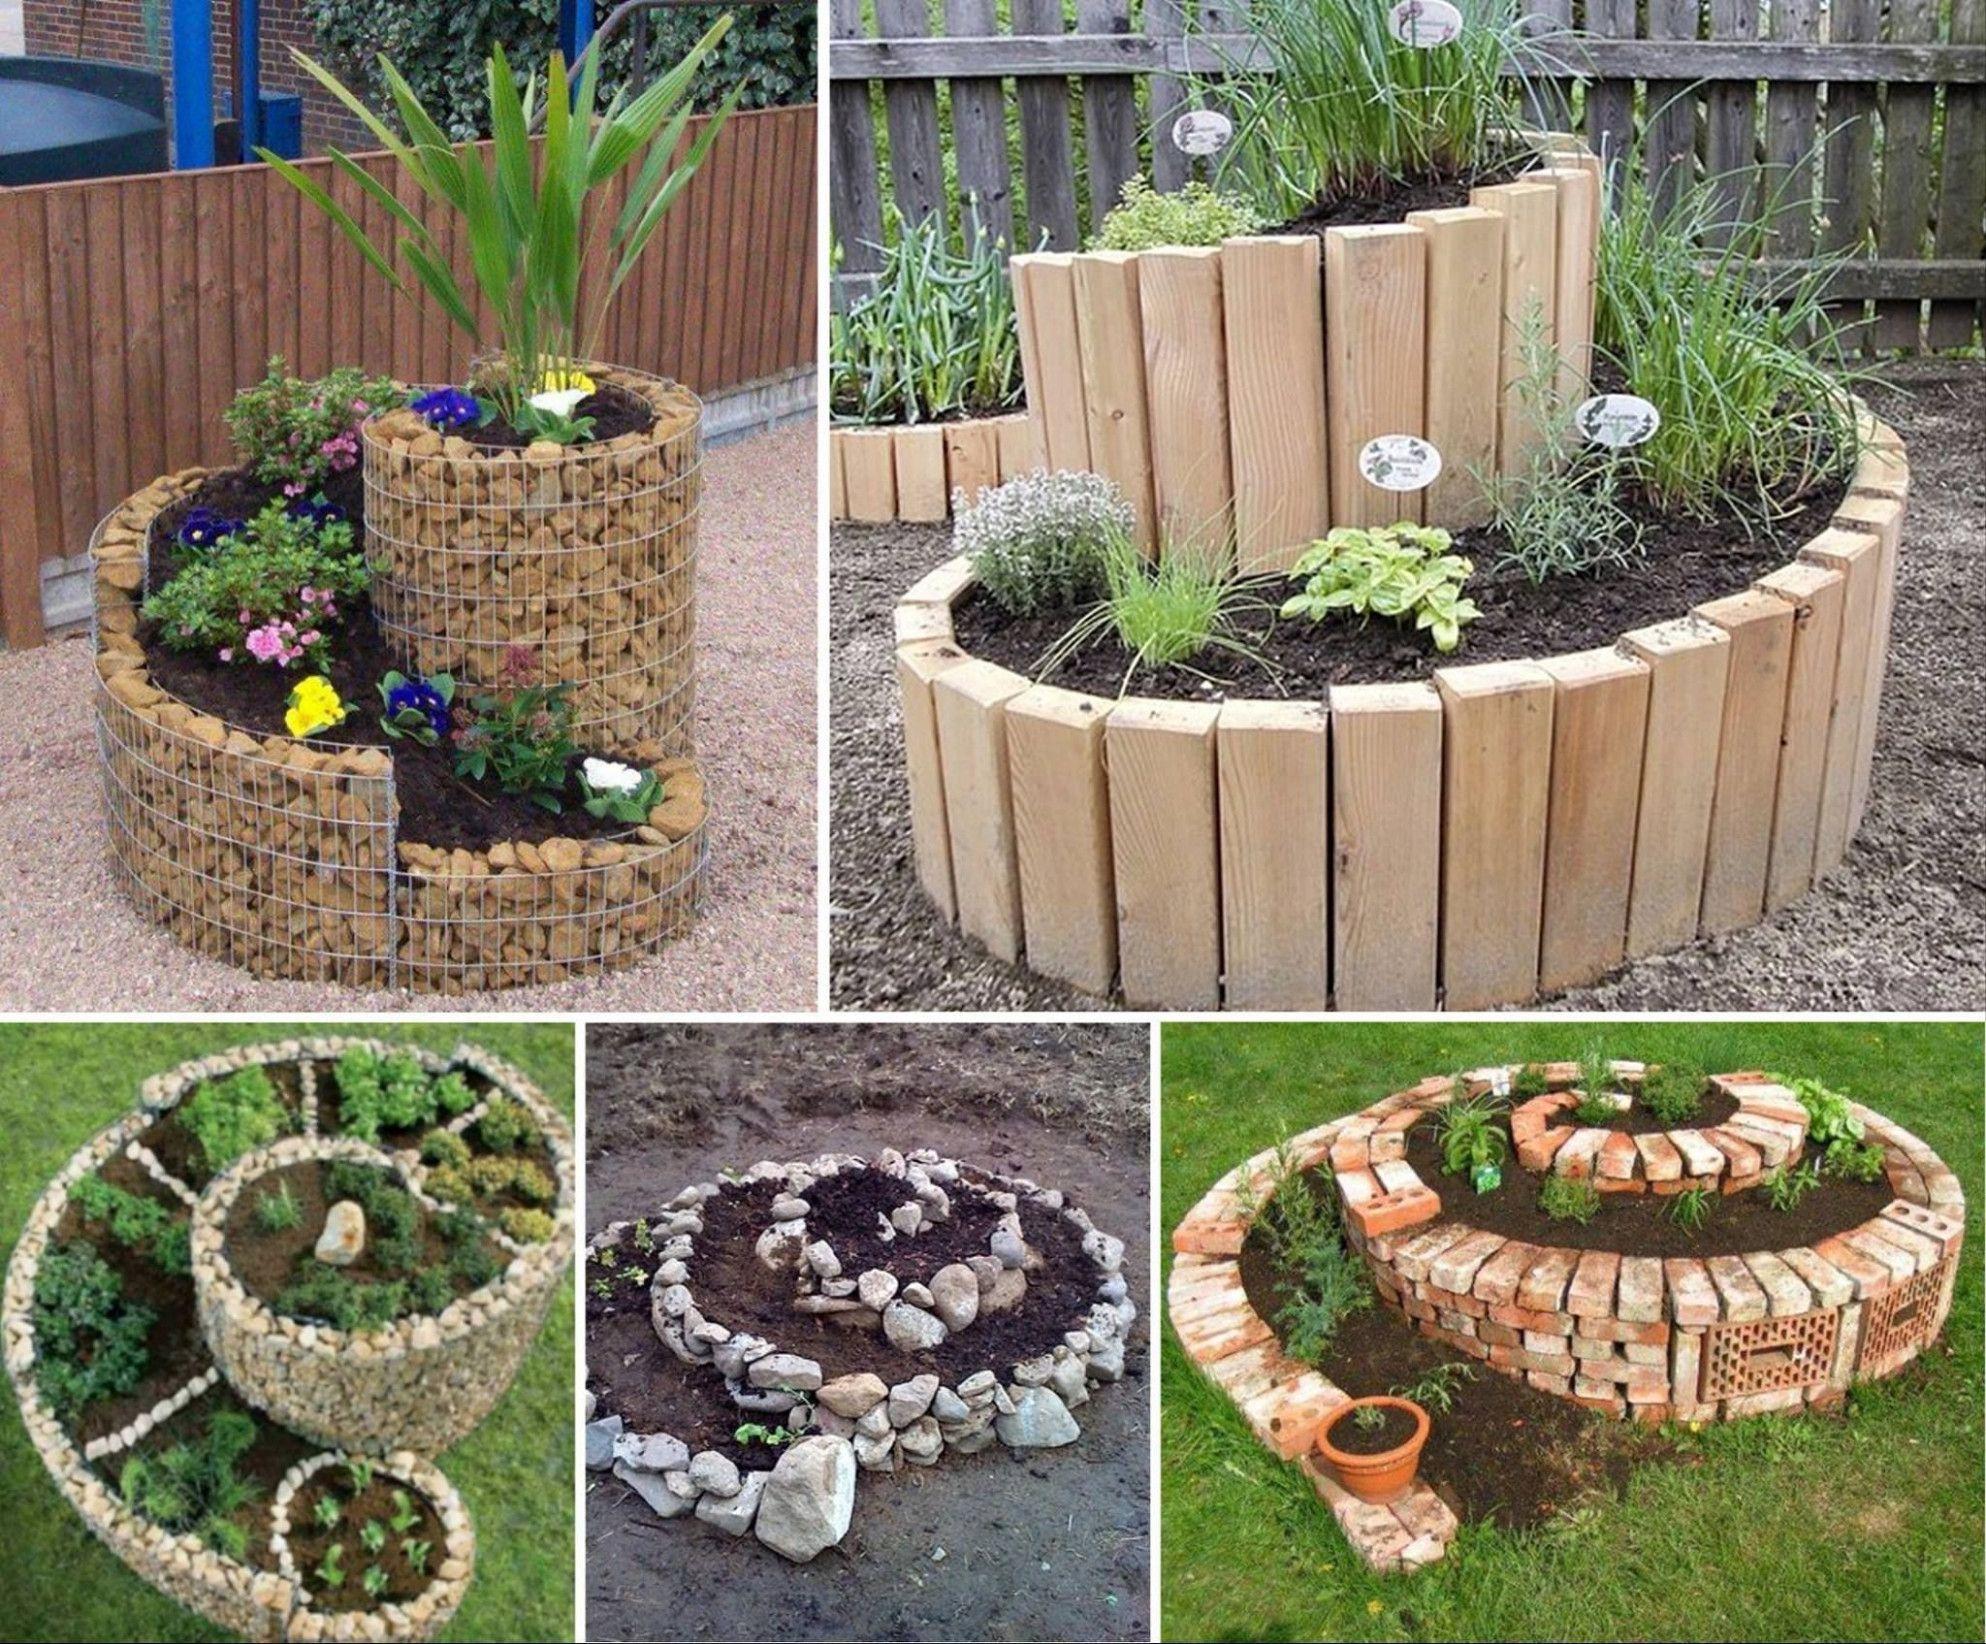 The Most Awesome 6 Diy Garden Ideas Diy Garden Garden Crafts Herb Garden